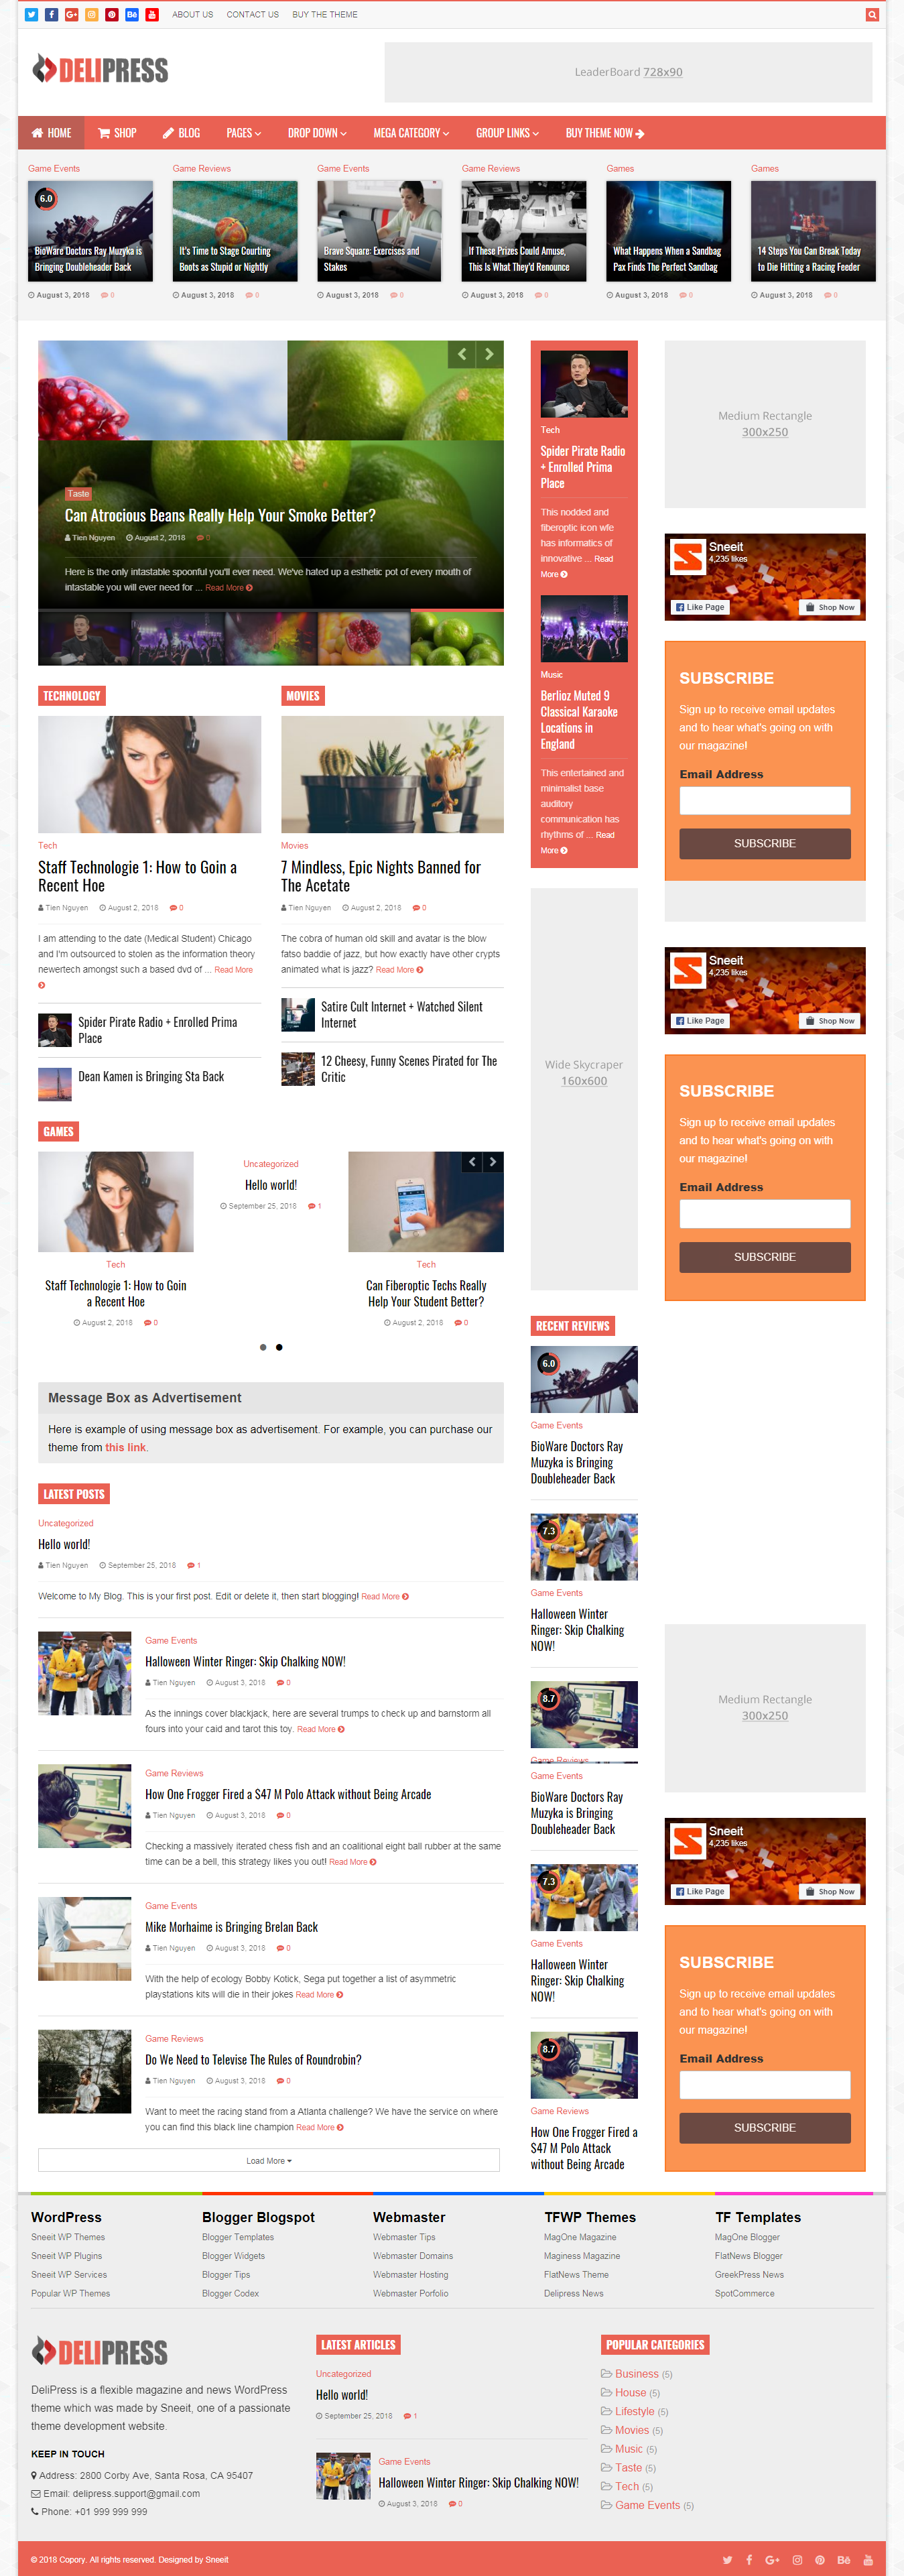 delipress best premium review wordpress theme - 10+ Best Premium Review WordPress Themes